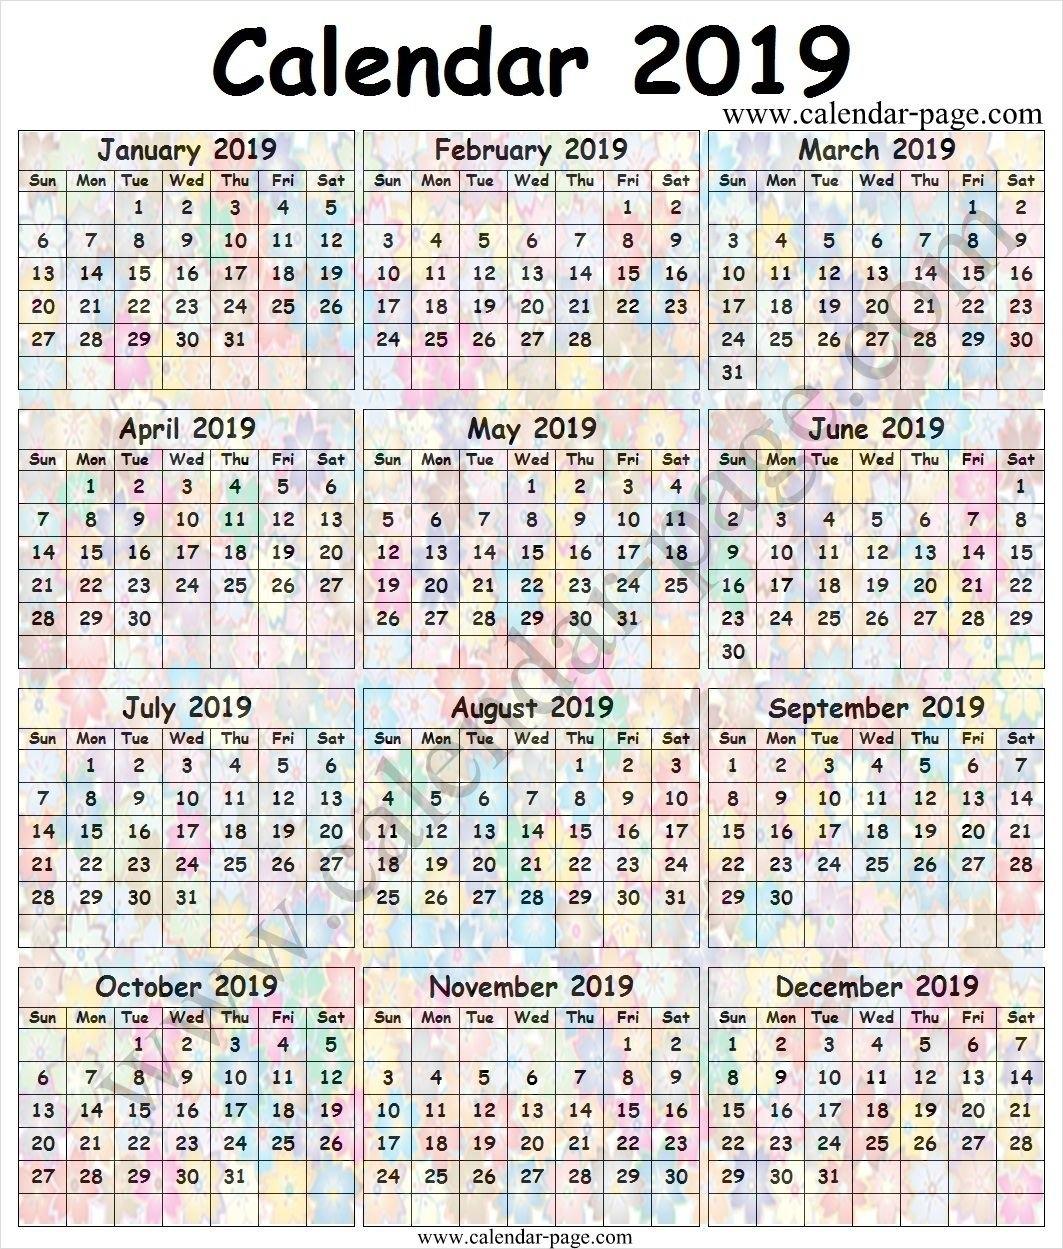 Tamil Monthly Calendar 2019   Calendar 2019 Yearly Template Calendar 2019 Tamil